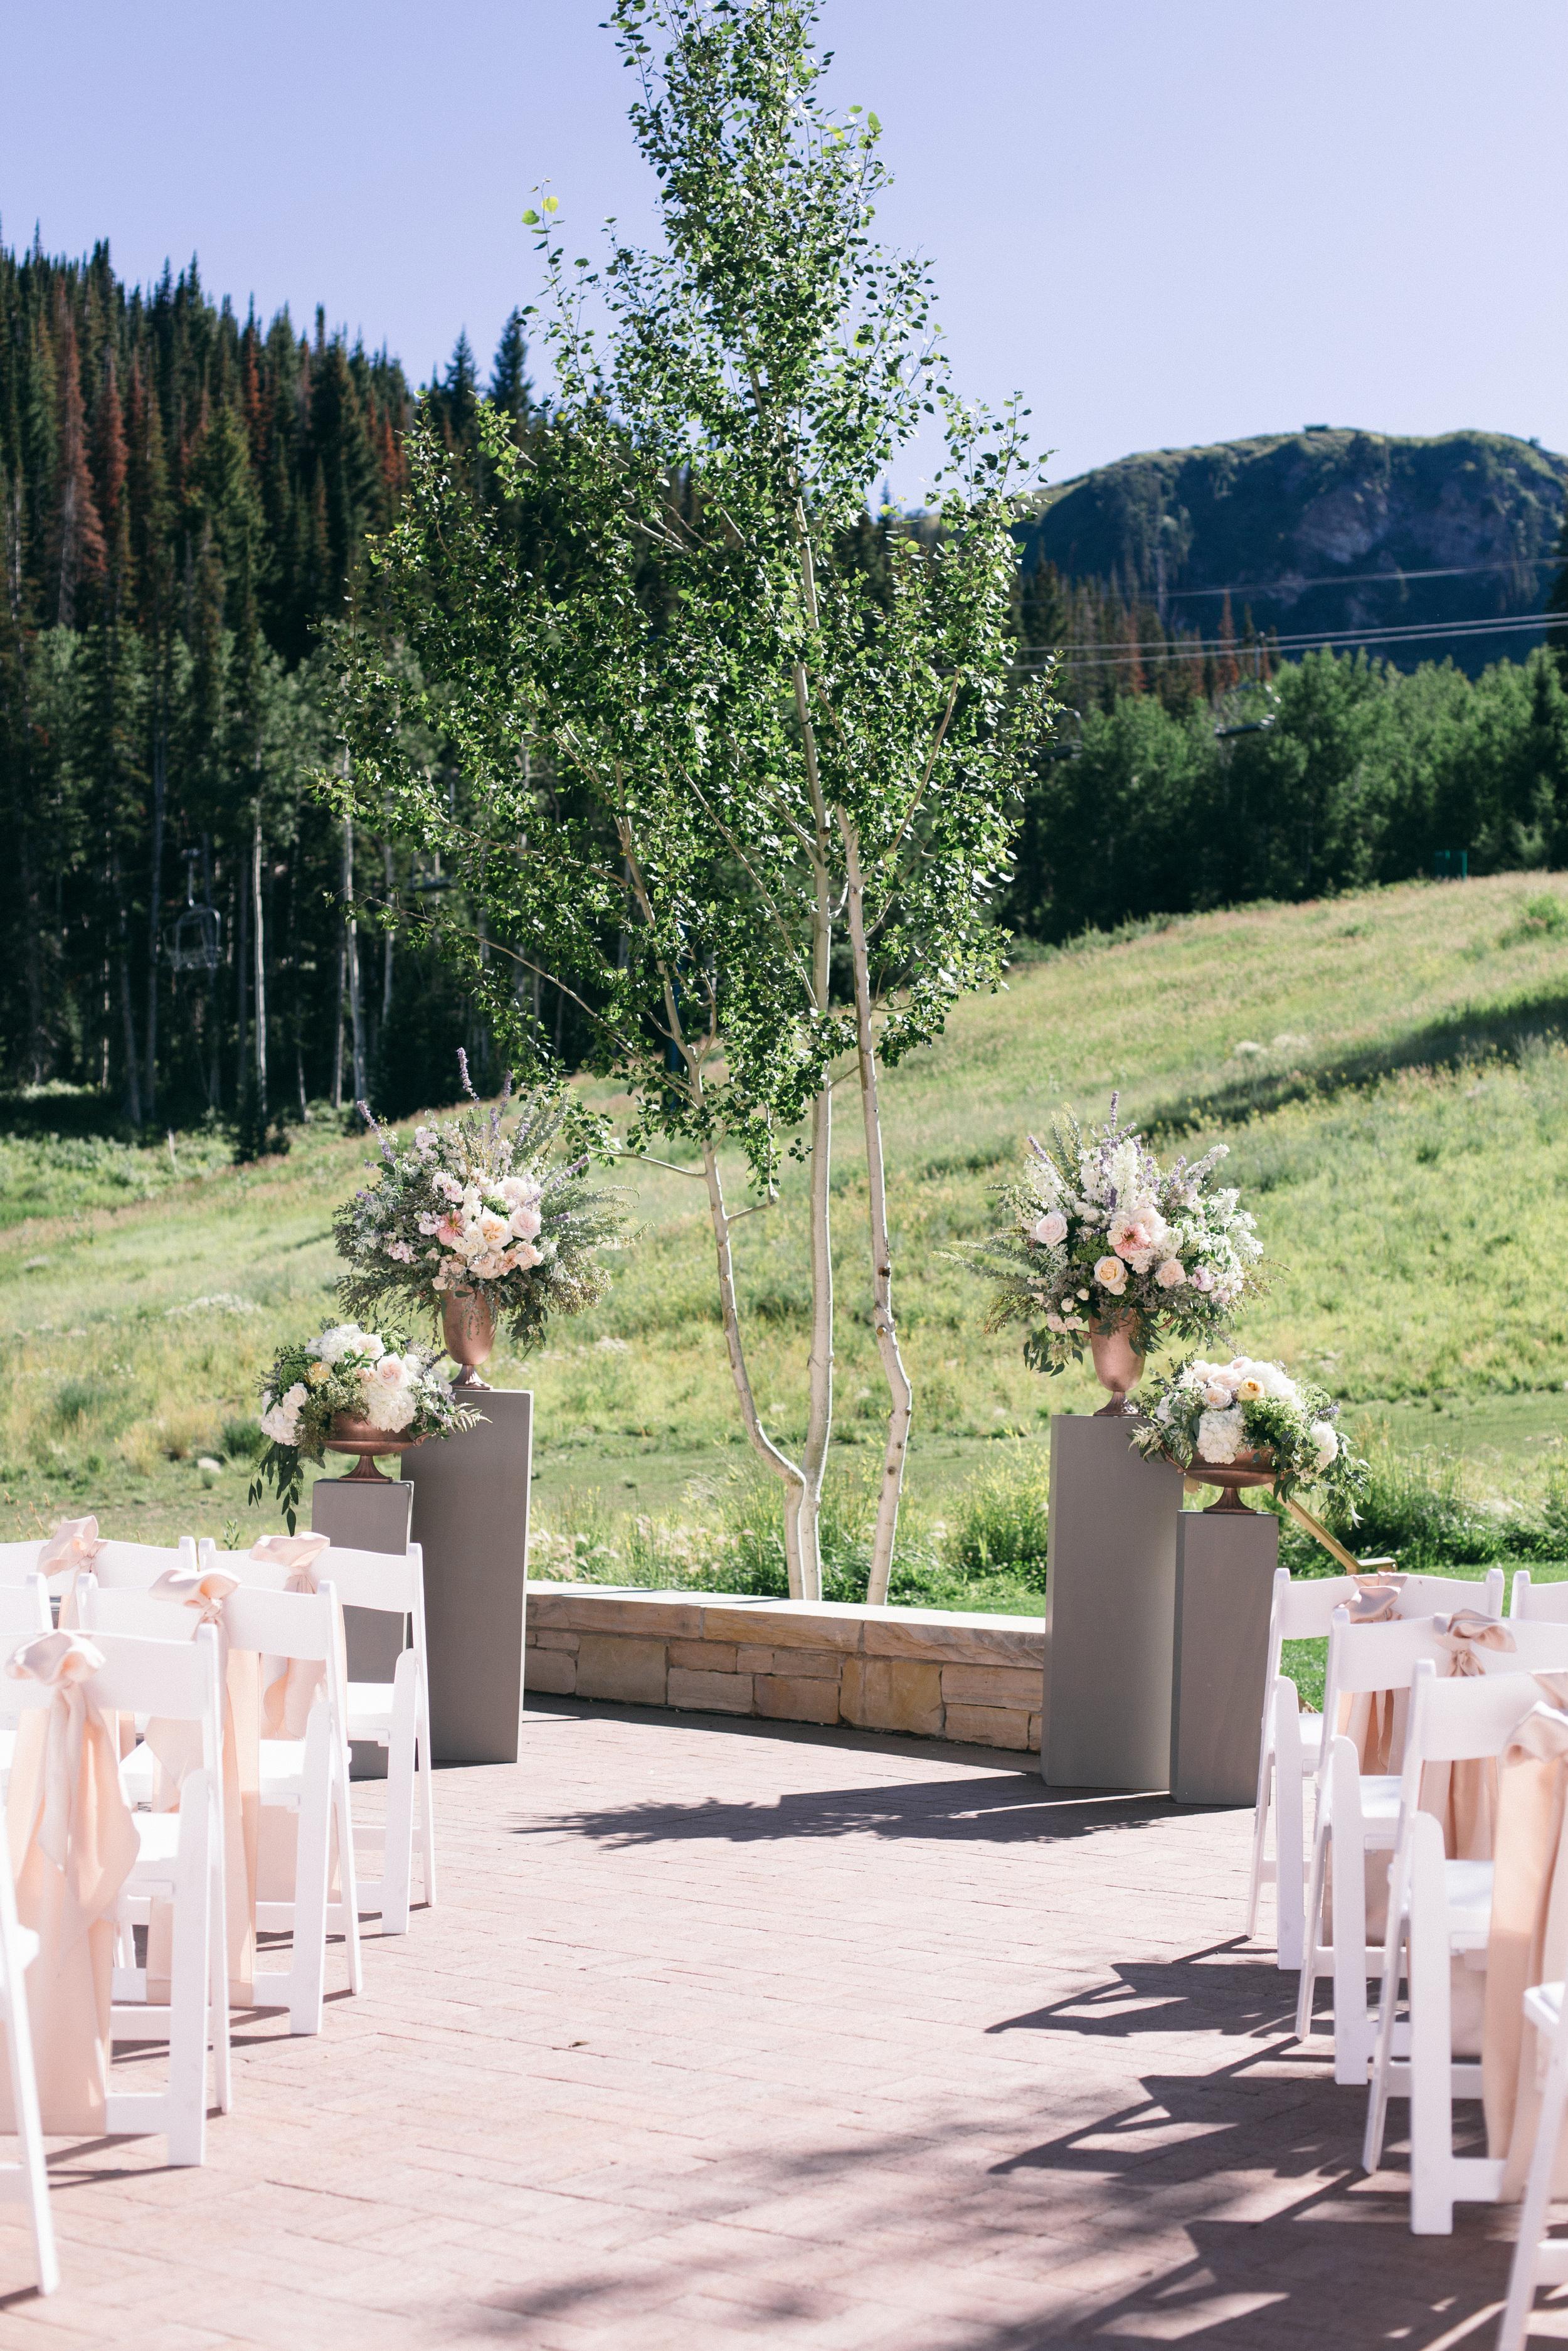 Montage Deer Valley Wedding | Romantic Summer Wedding | Michelle Leo Events | Utah Event Planner and Designer | Shannon Elizabeth Photography